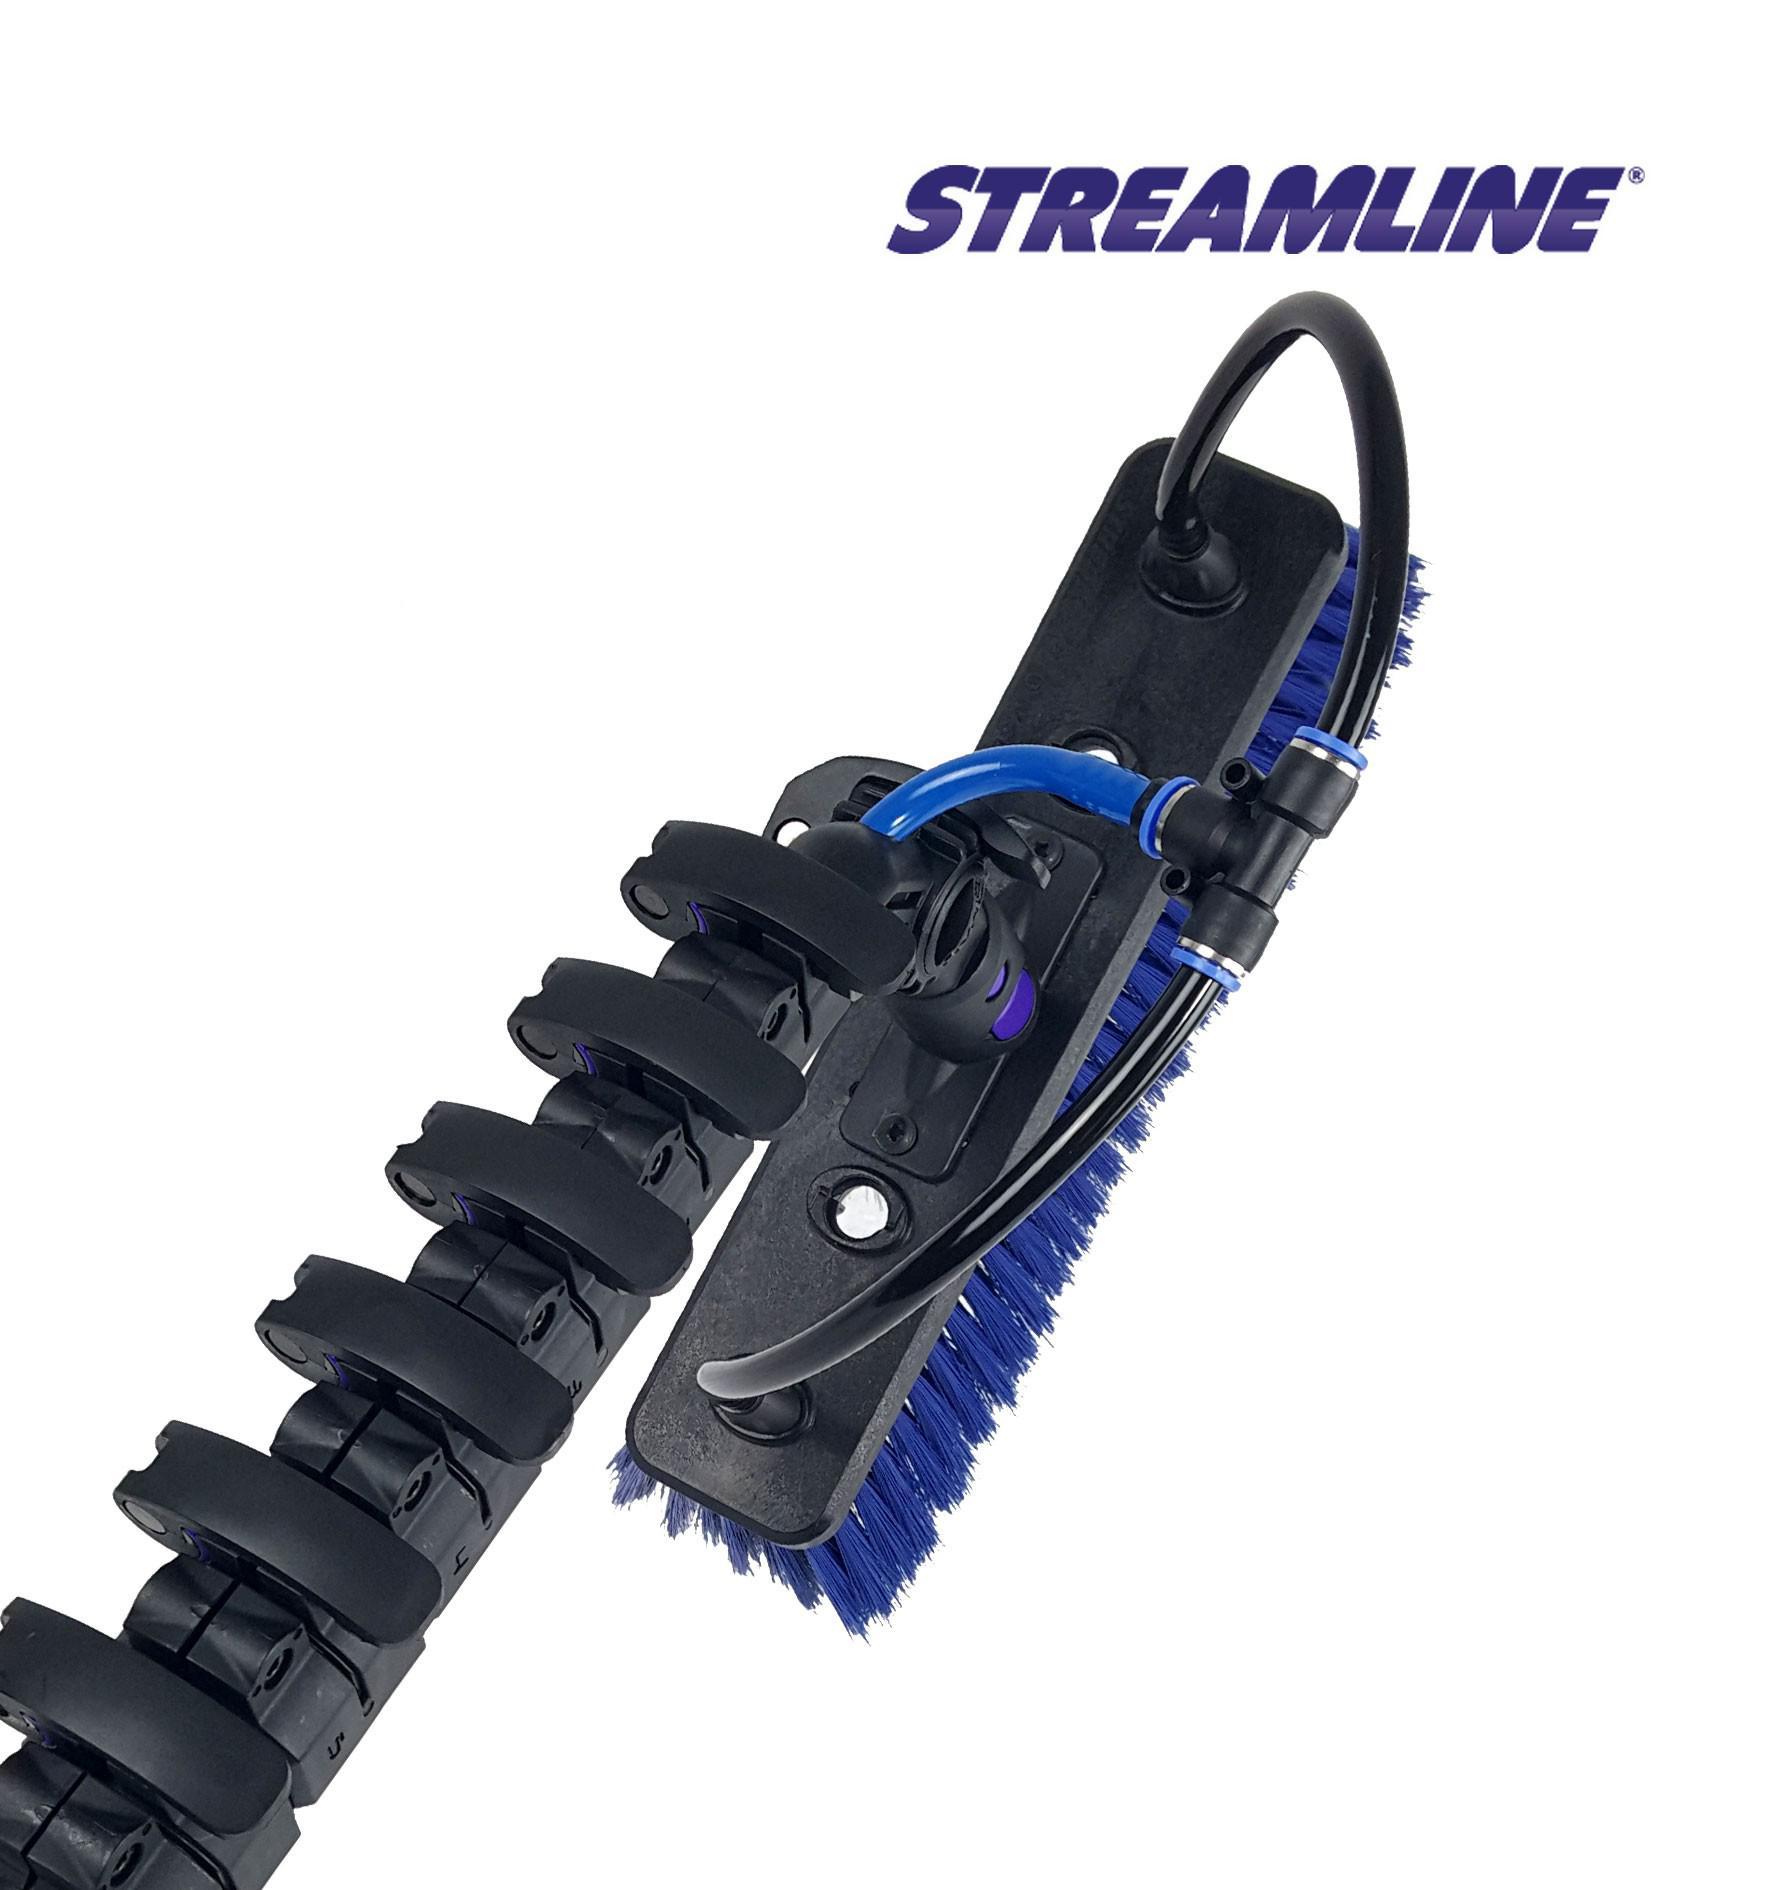 Streamline Ova-8 Pole